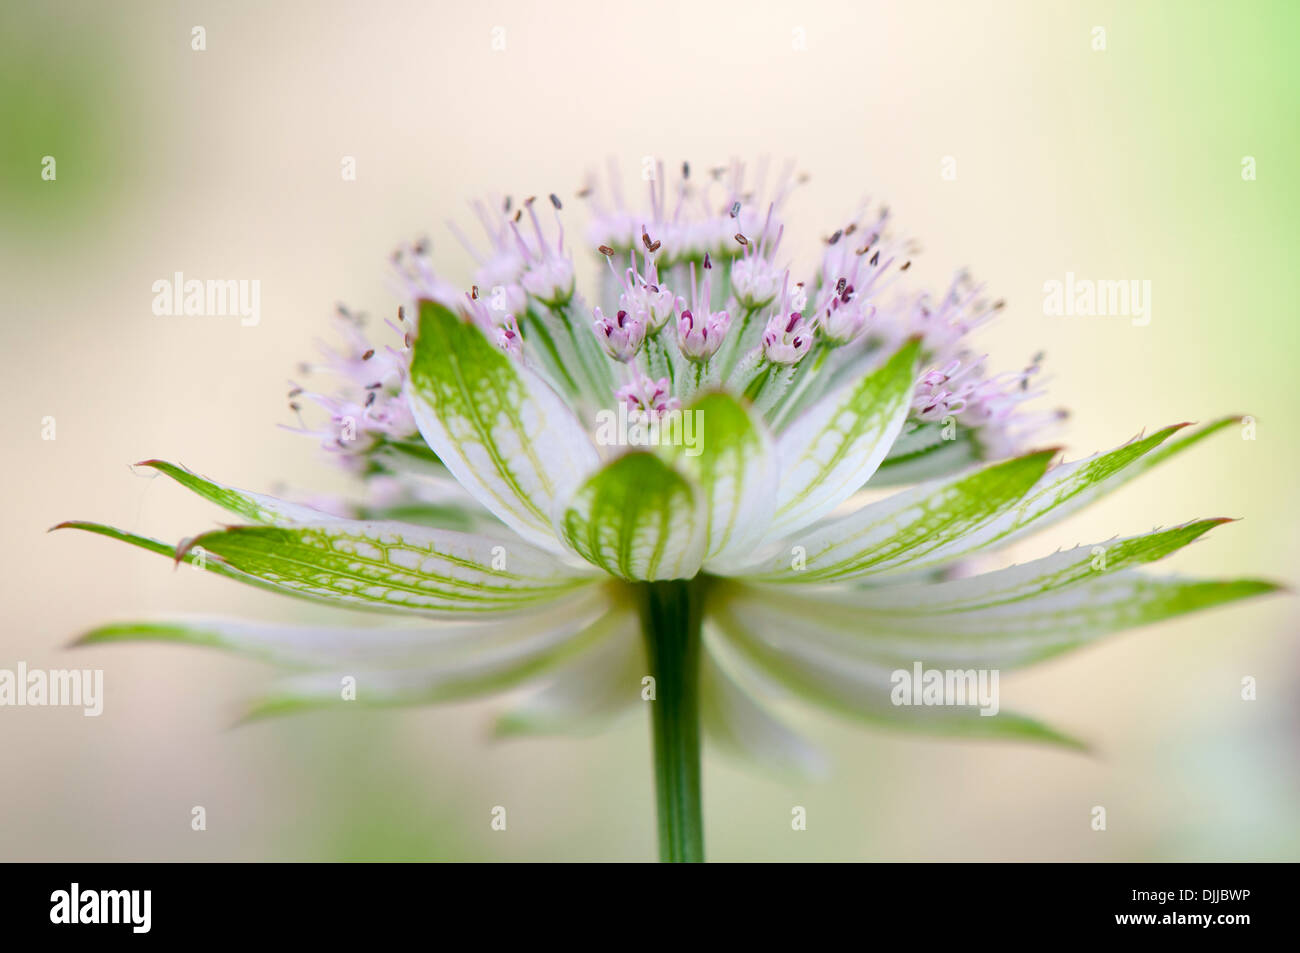 Imagen cercana de un solo blanco/rosa Astrantia gran flor comúnmente conocida como Masterwort, imagen tomada contra un fondo suave Imagen De Stock